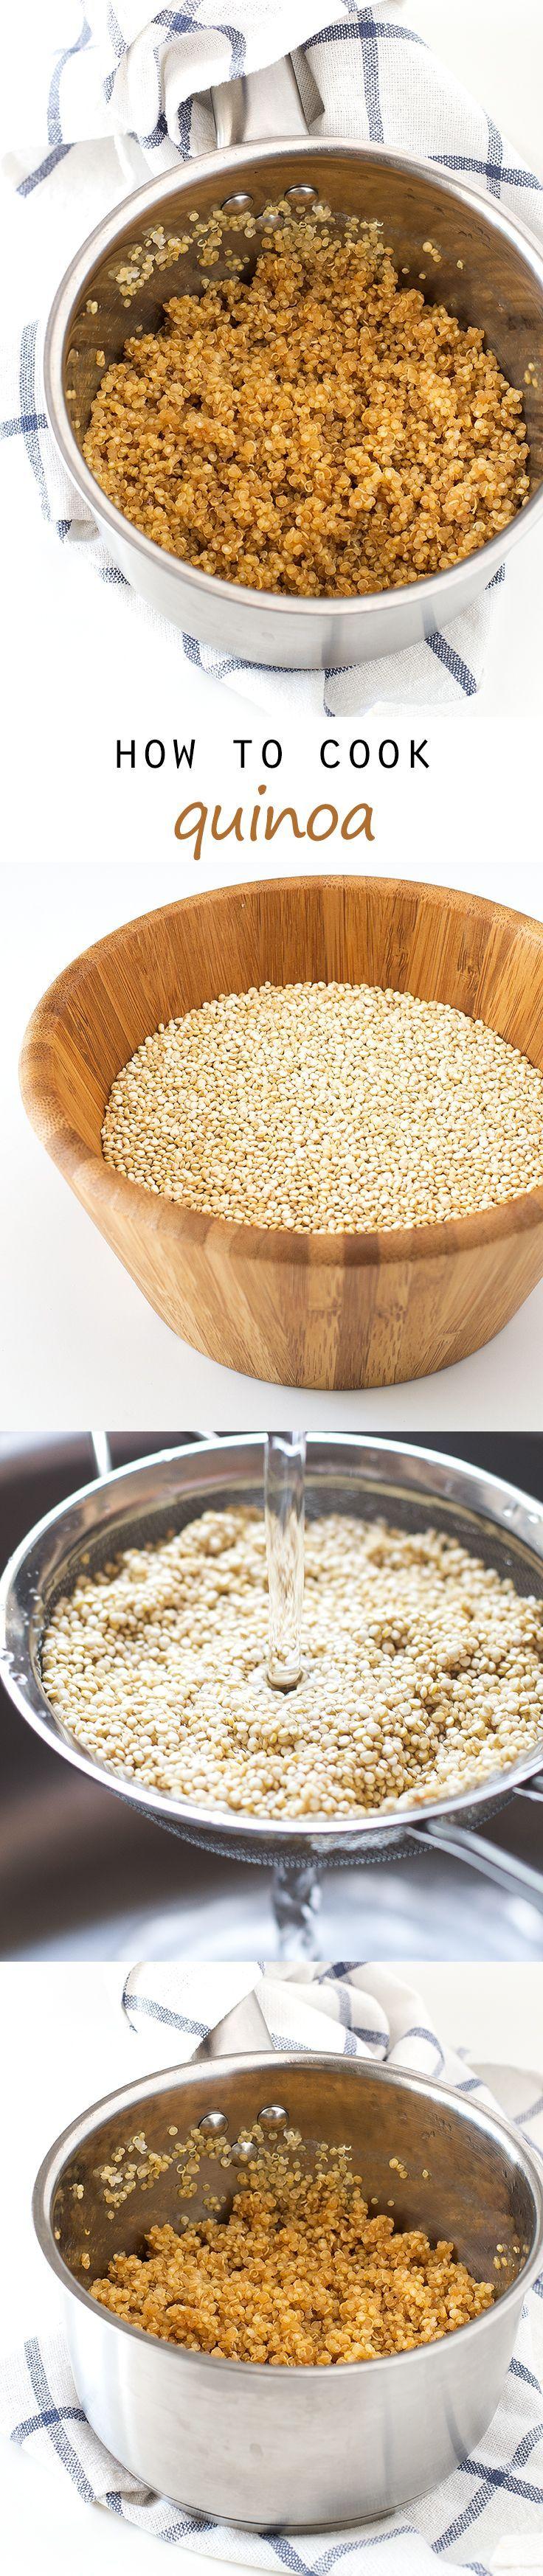 How To Cook Quinoa | http://simpleveganblog.com #vegan #glutenfree